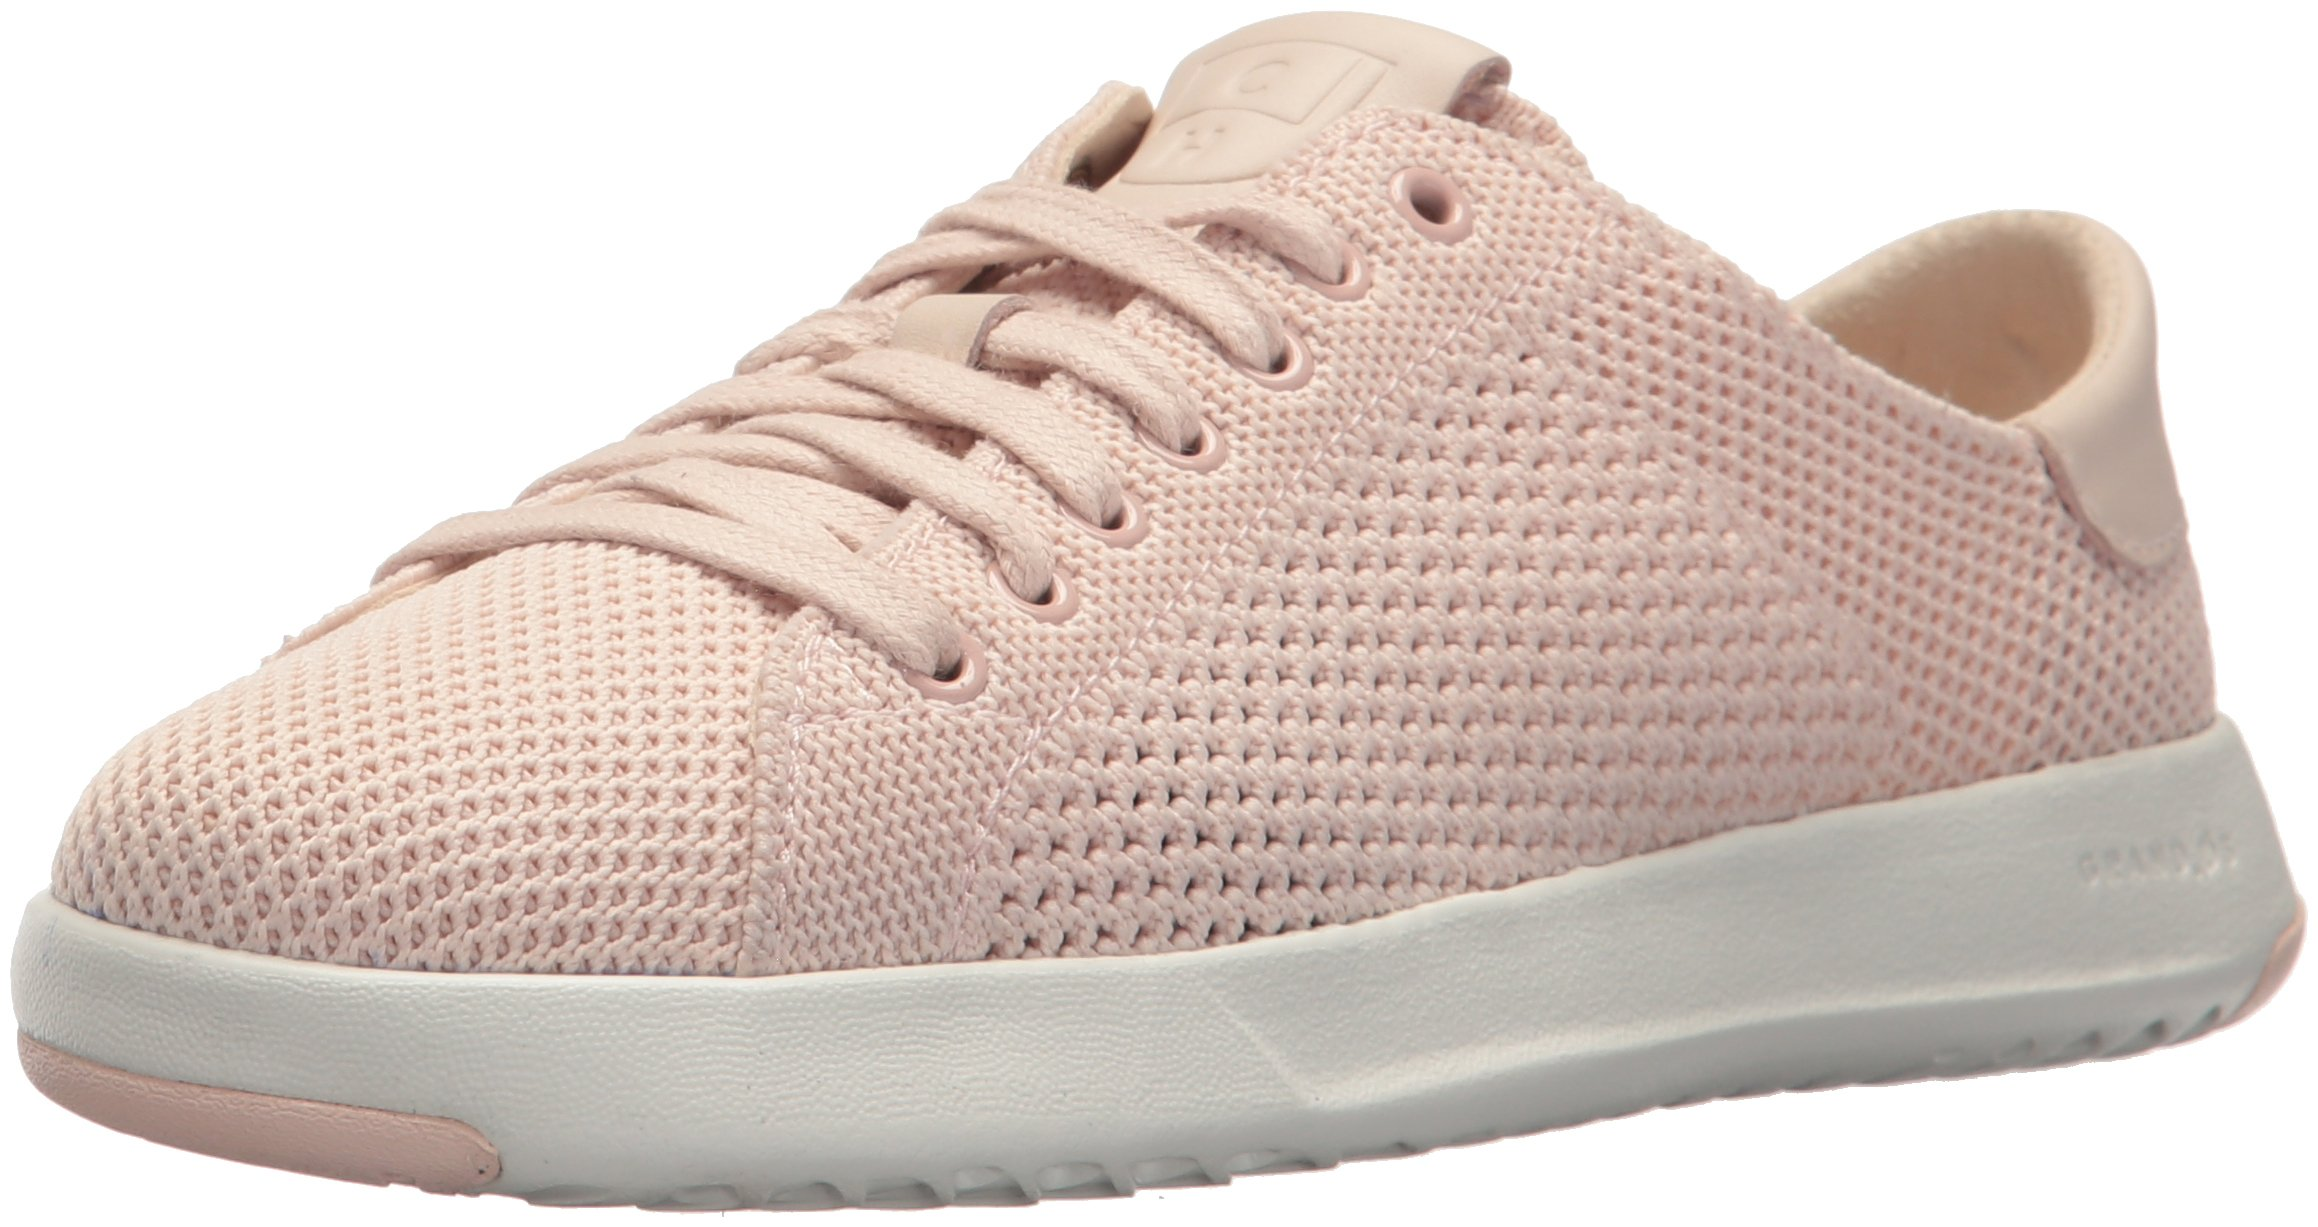 Cole Haan Women's Grandpro Tennis Stitchlite Sneaker, Peach Blush, 7.5 B US